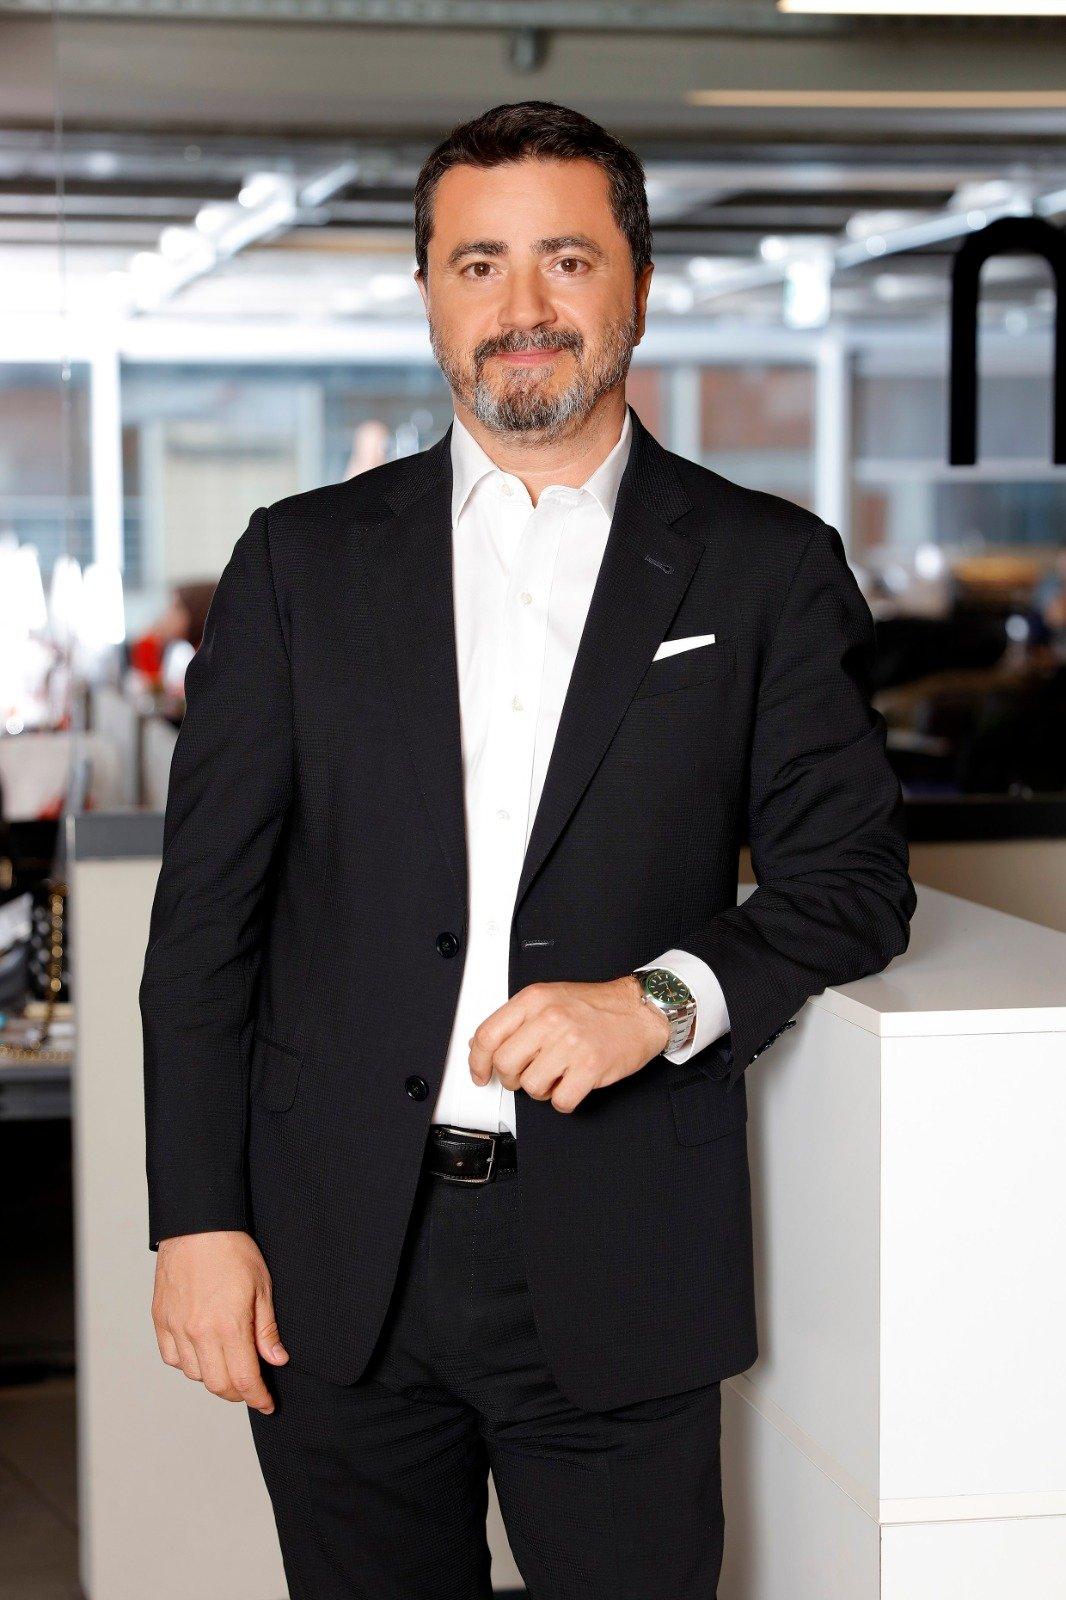 Modanisa's chairman of the board, Kerim Türe.